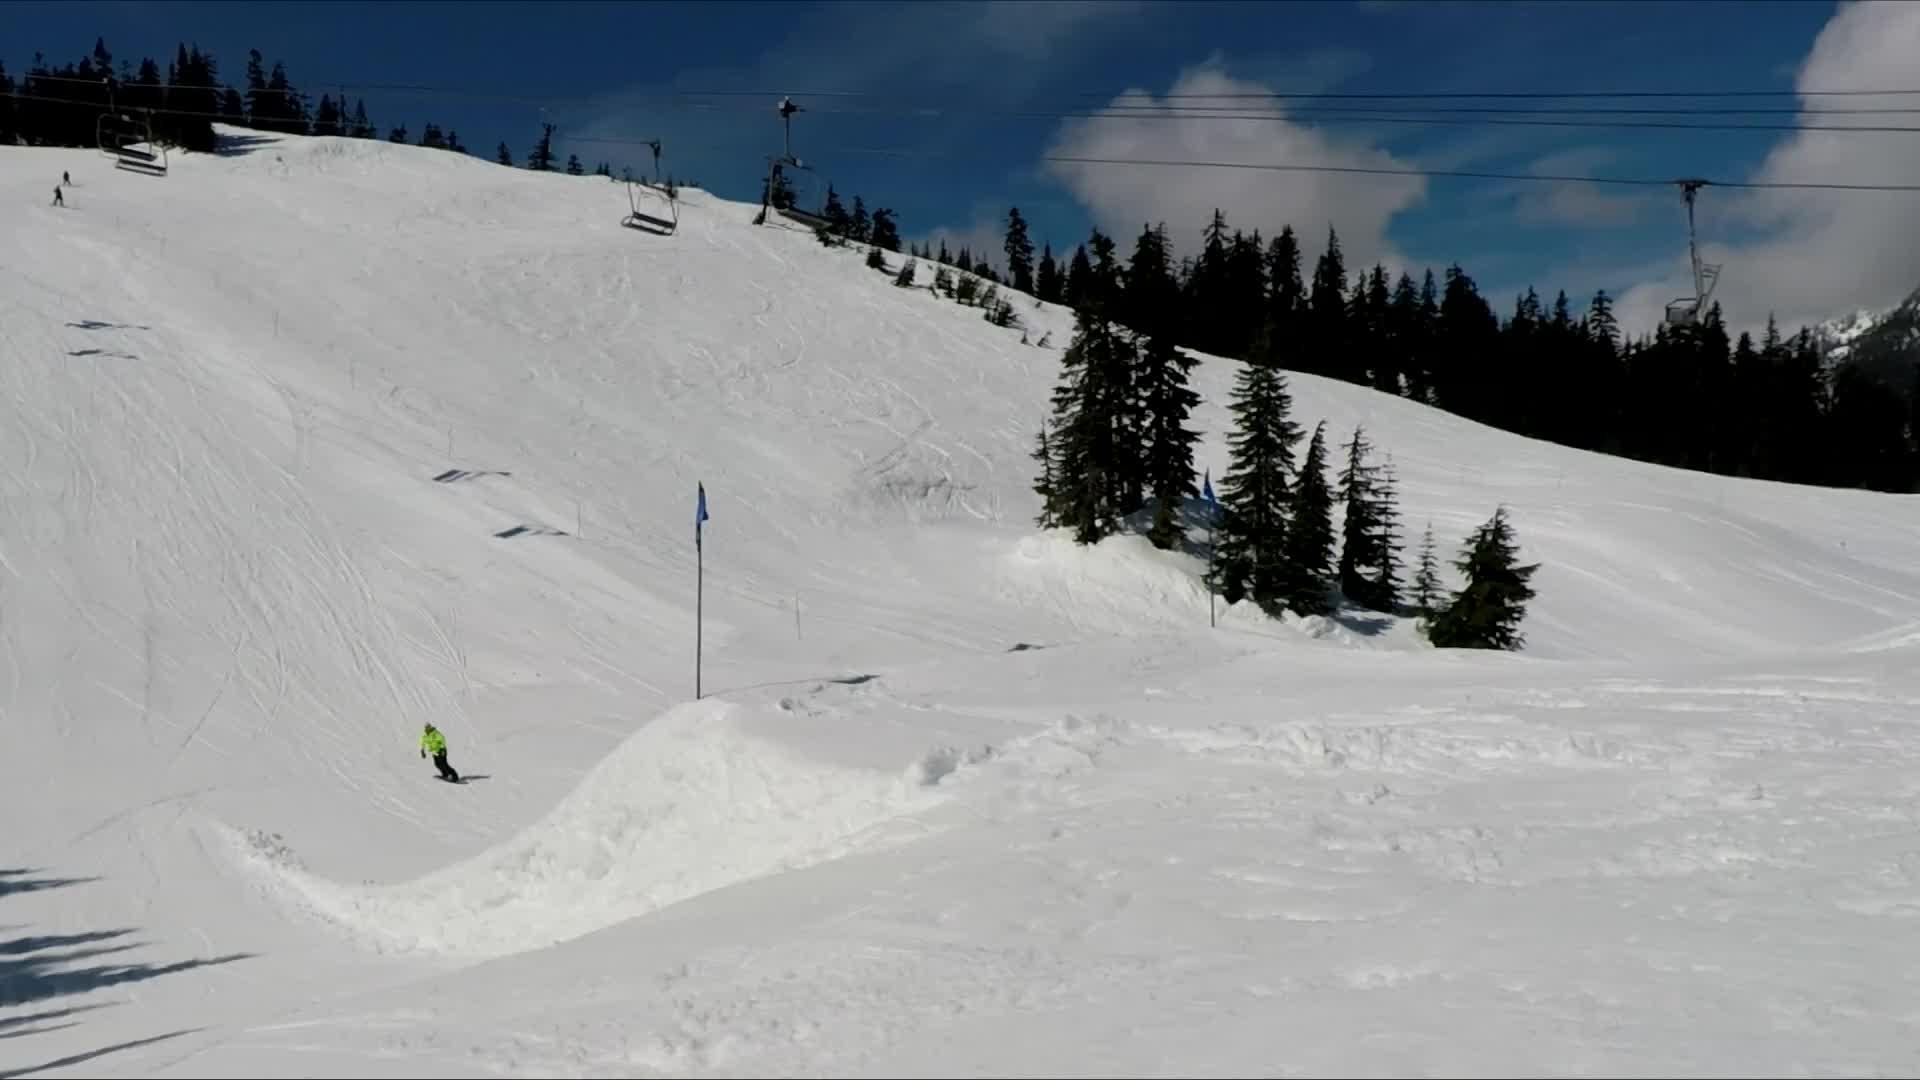 snowboard, snowboarding, sports, trueshreddit, Untitled GIFs